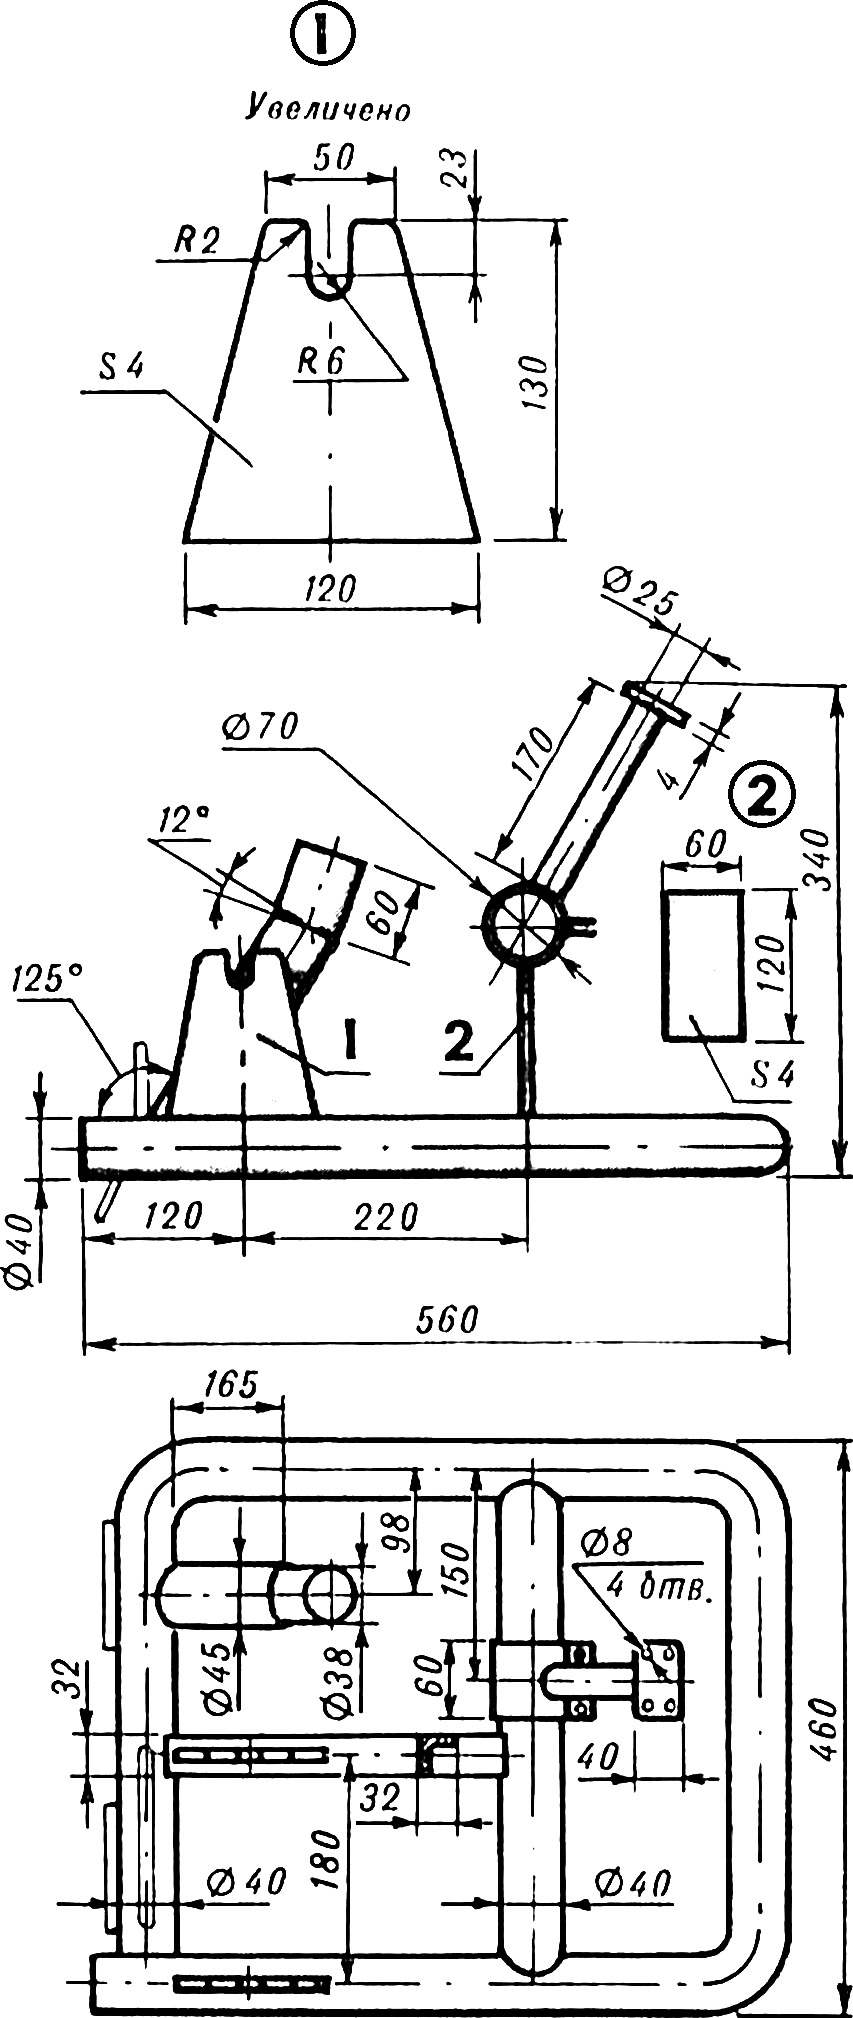 Frame power unit Assembly.